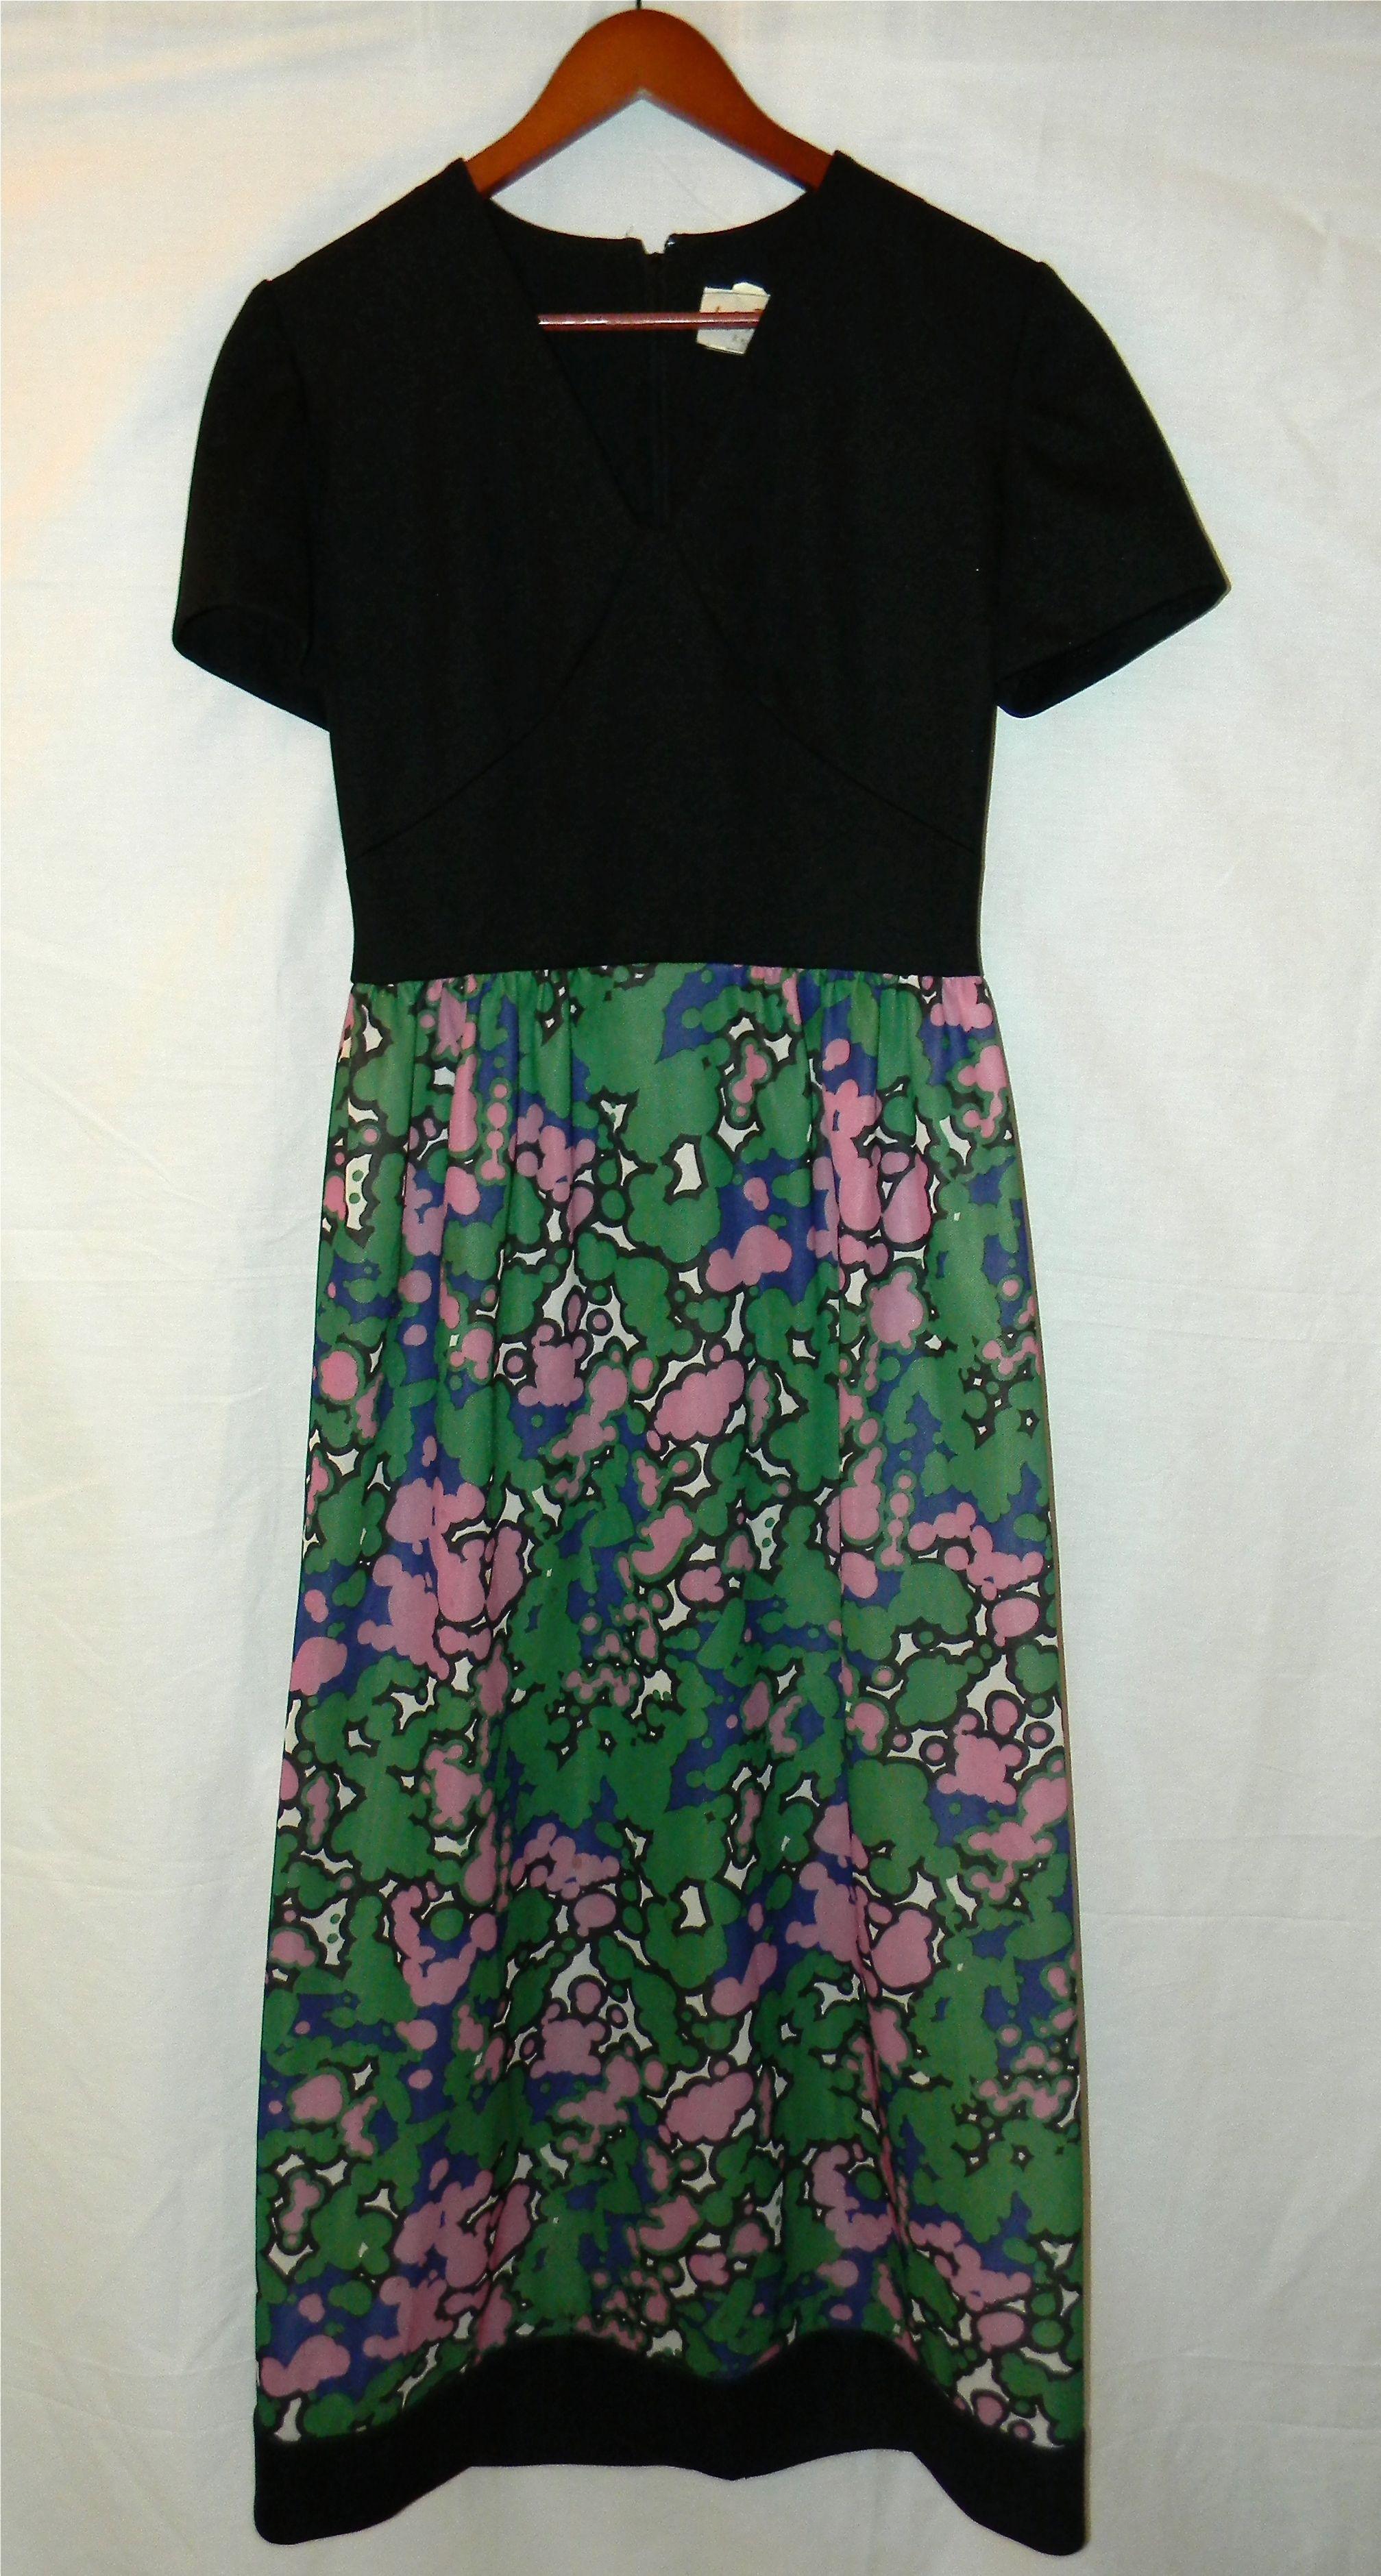 Vintage s s dress leslie fay mod black and bright colors